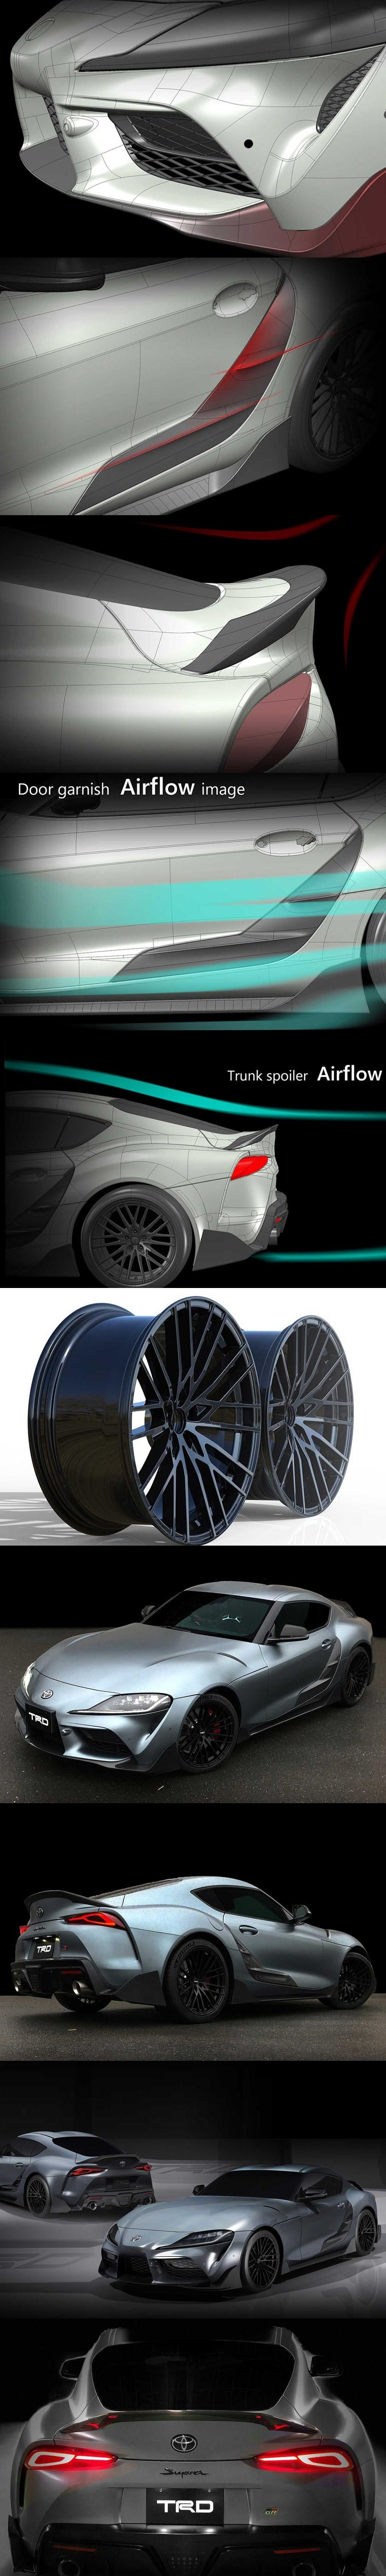 Presenting The Toyota Supra Performance Line Concept TRD